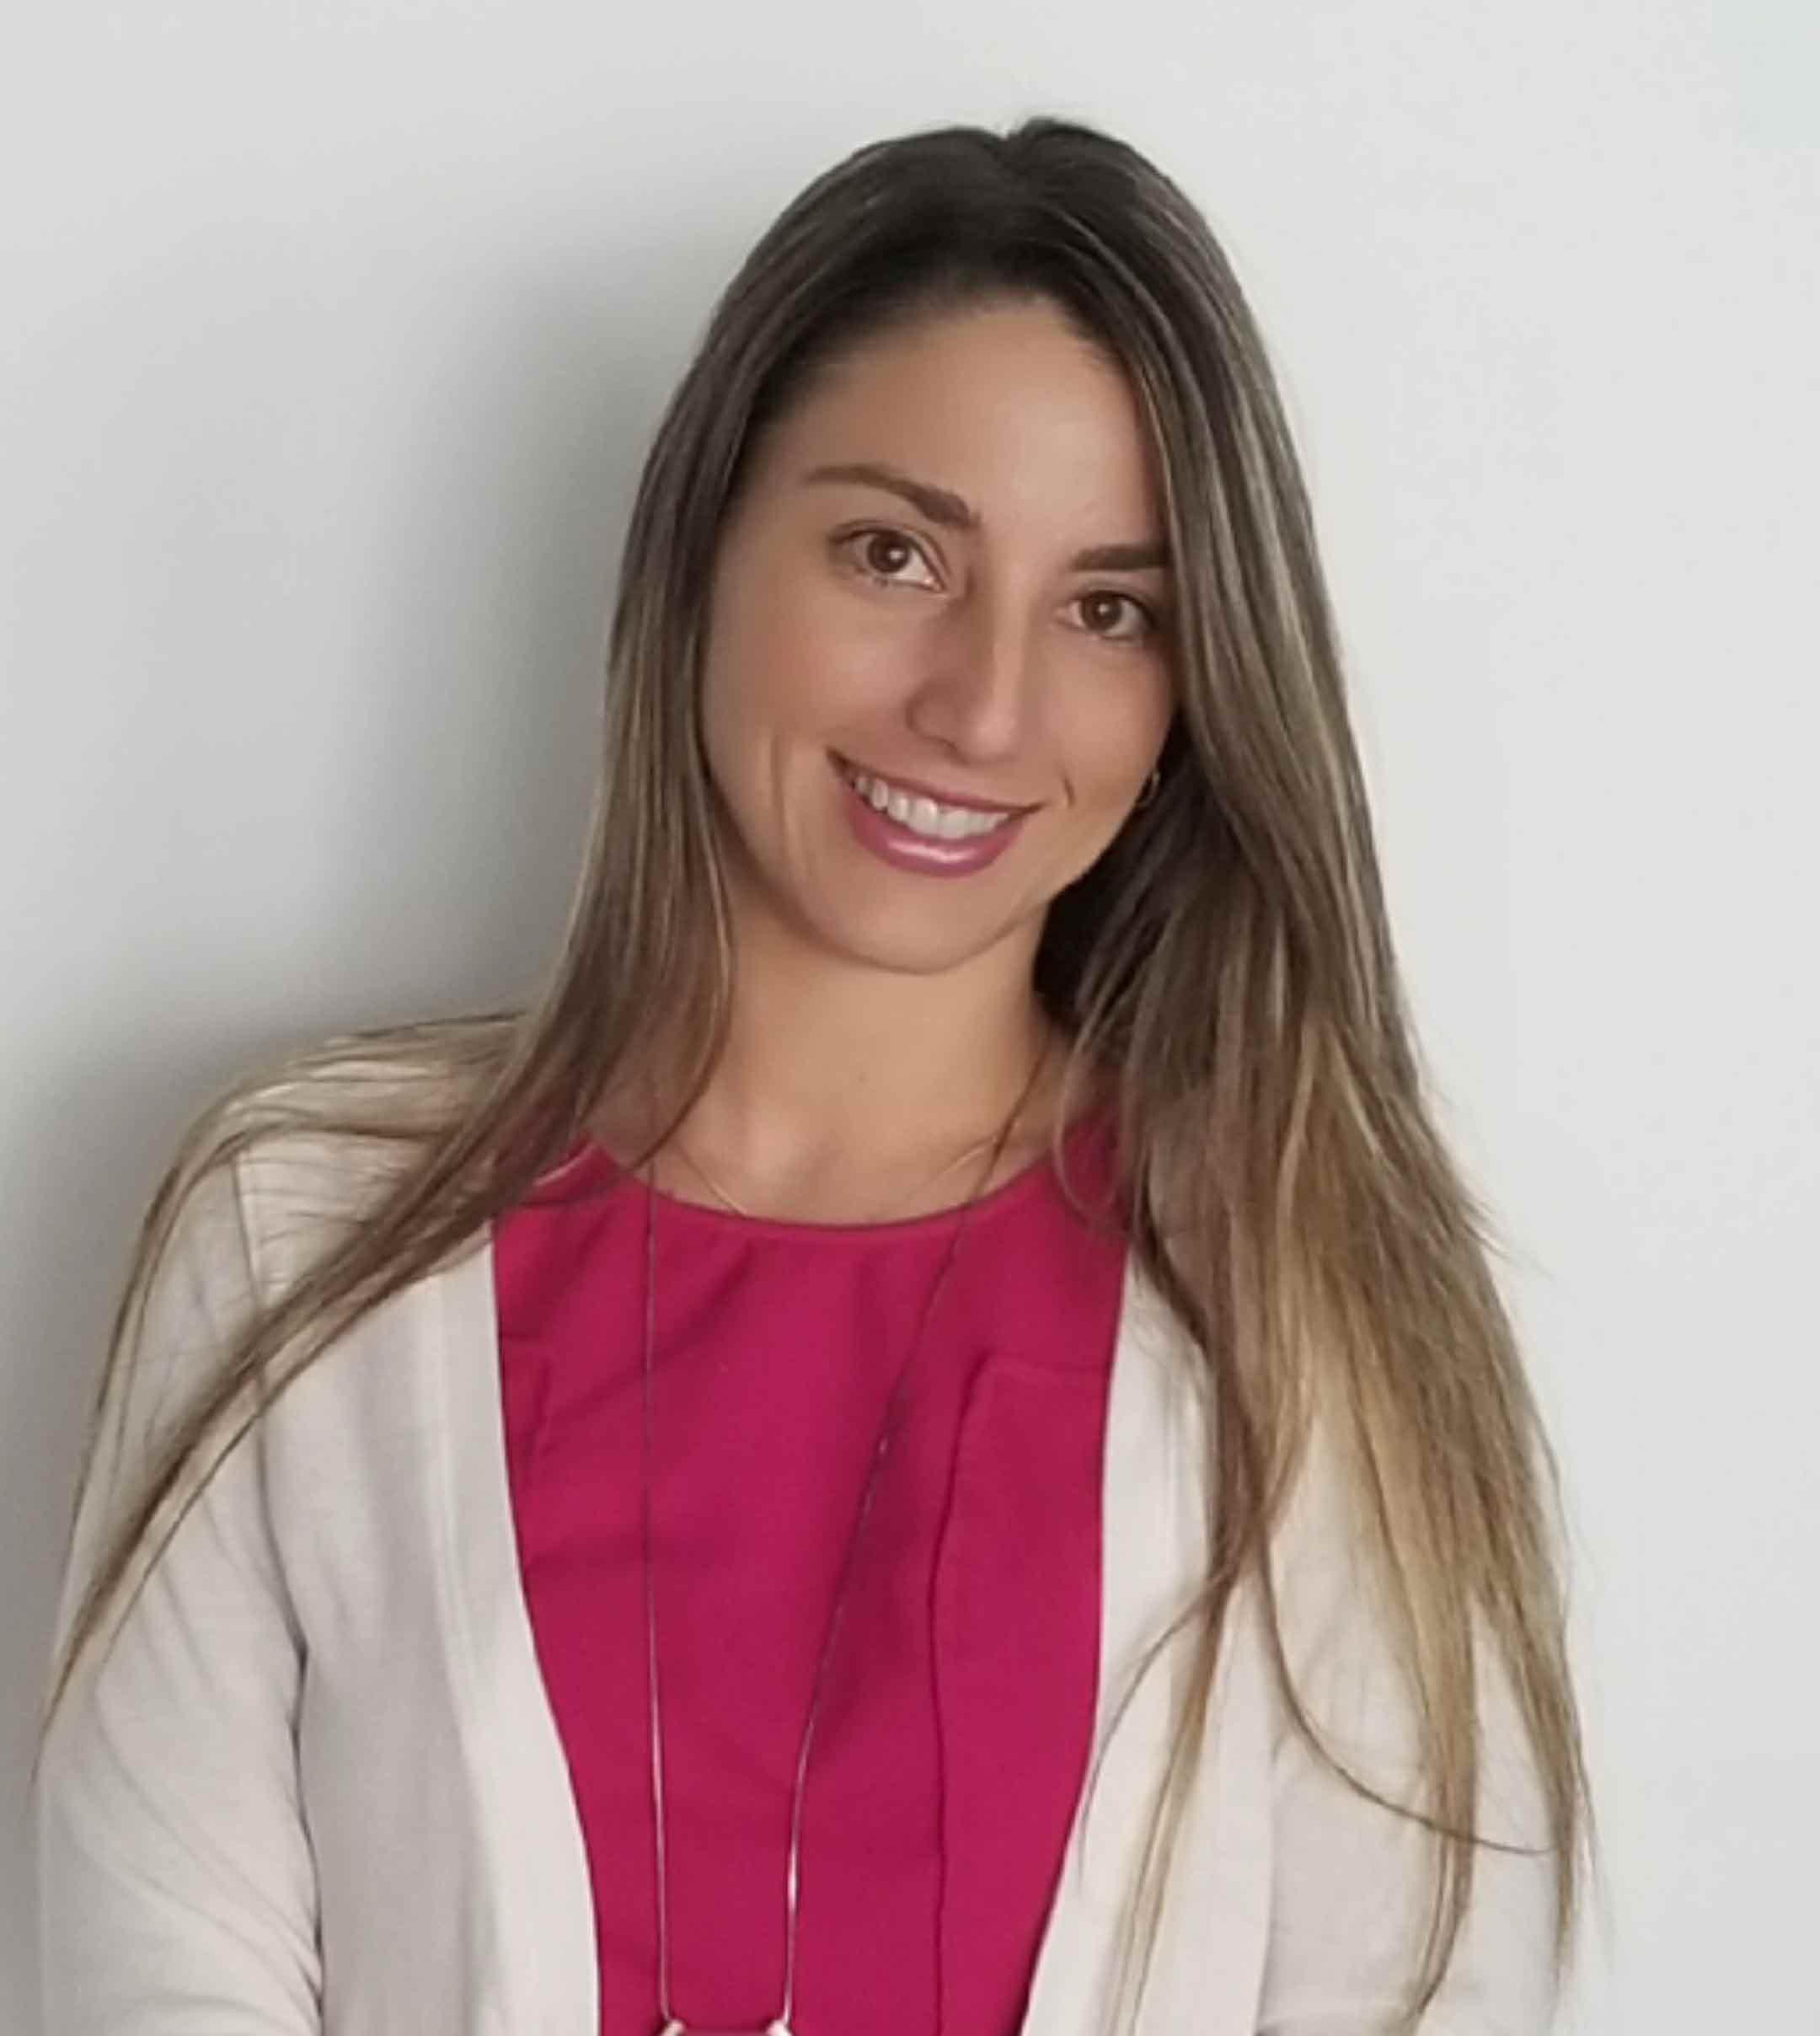 Giselle Rodriguez Nude Photos 18